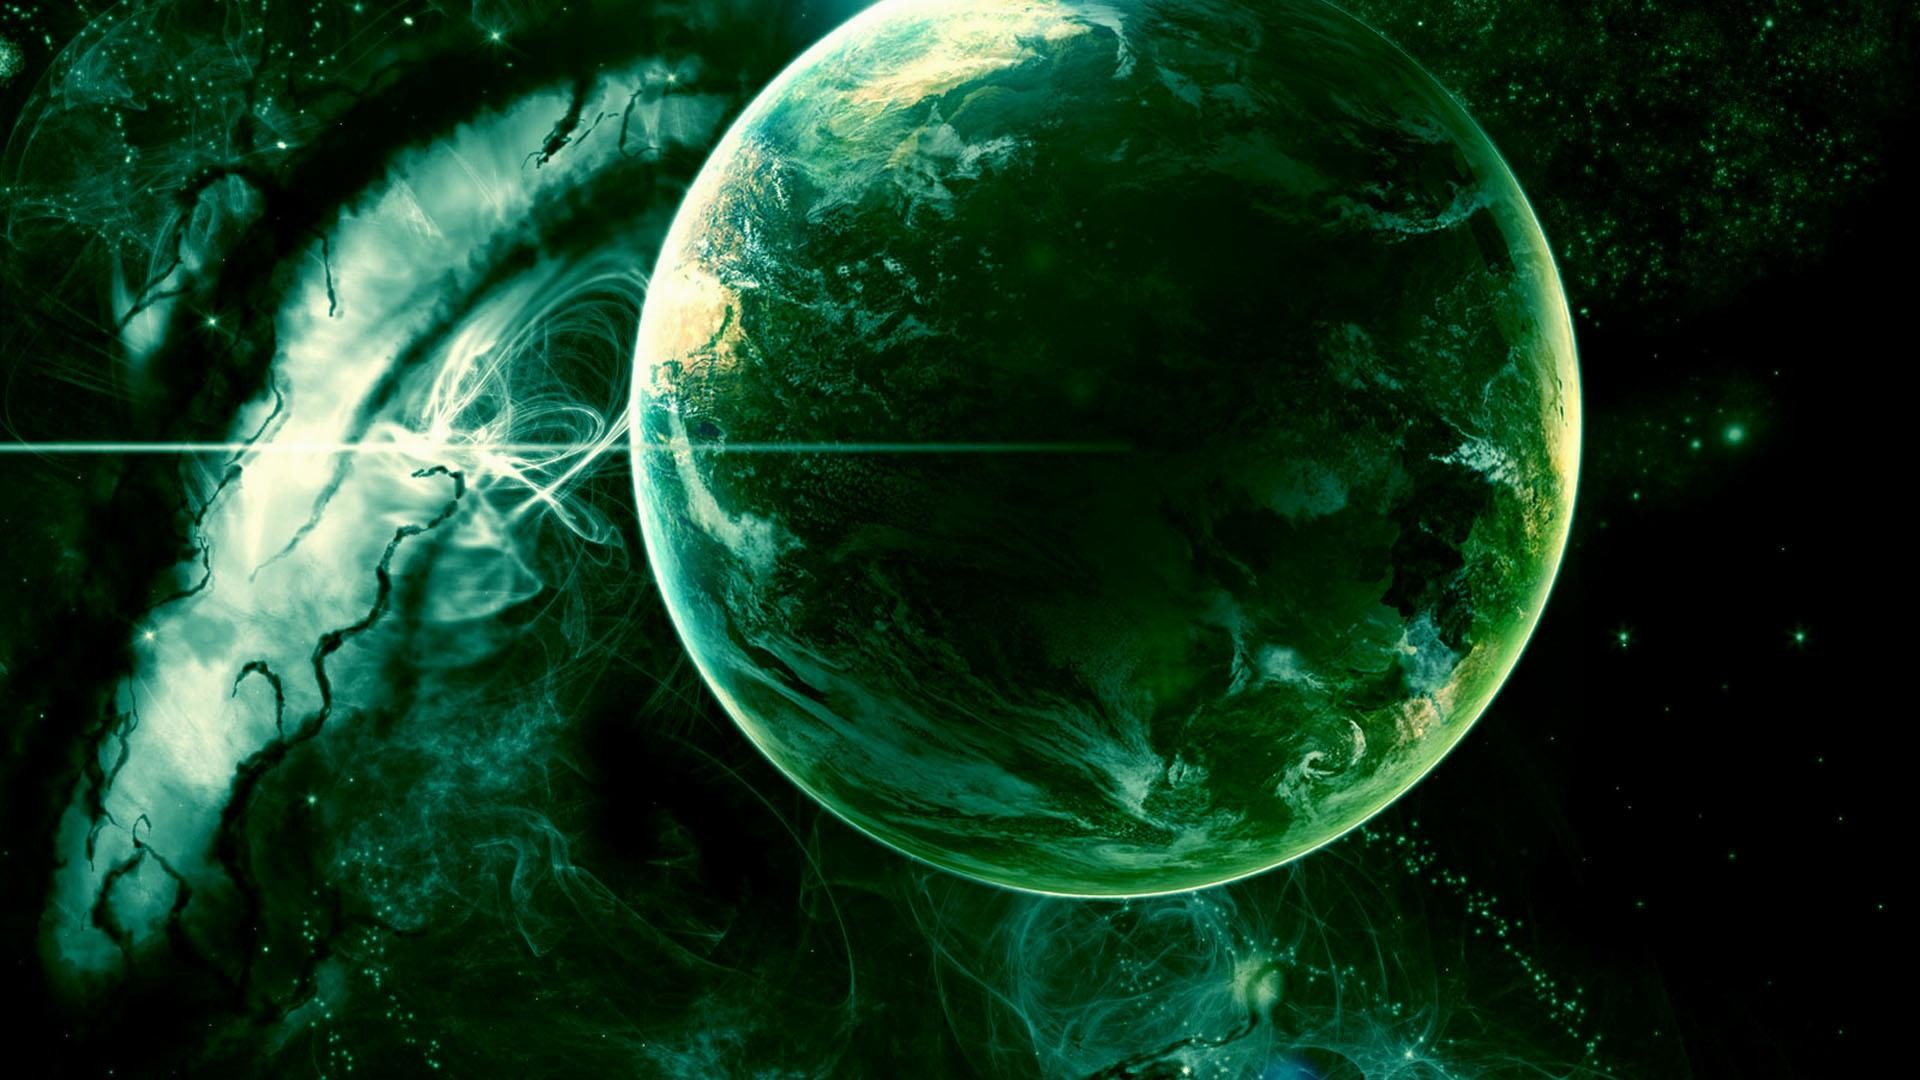 wallpaper.wiki-1080p-Space-Wallpaper-Download-Free-PIC-